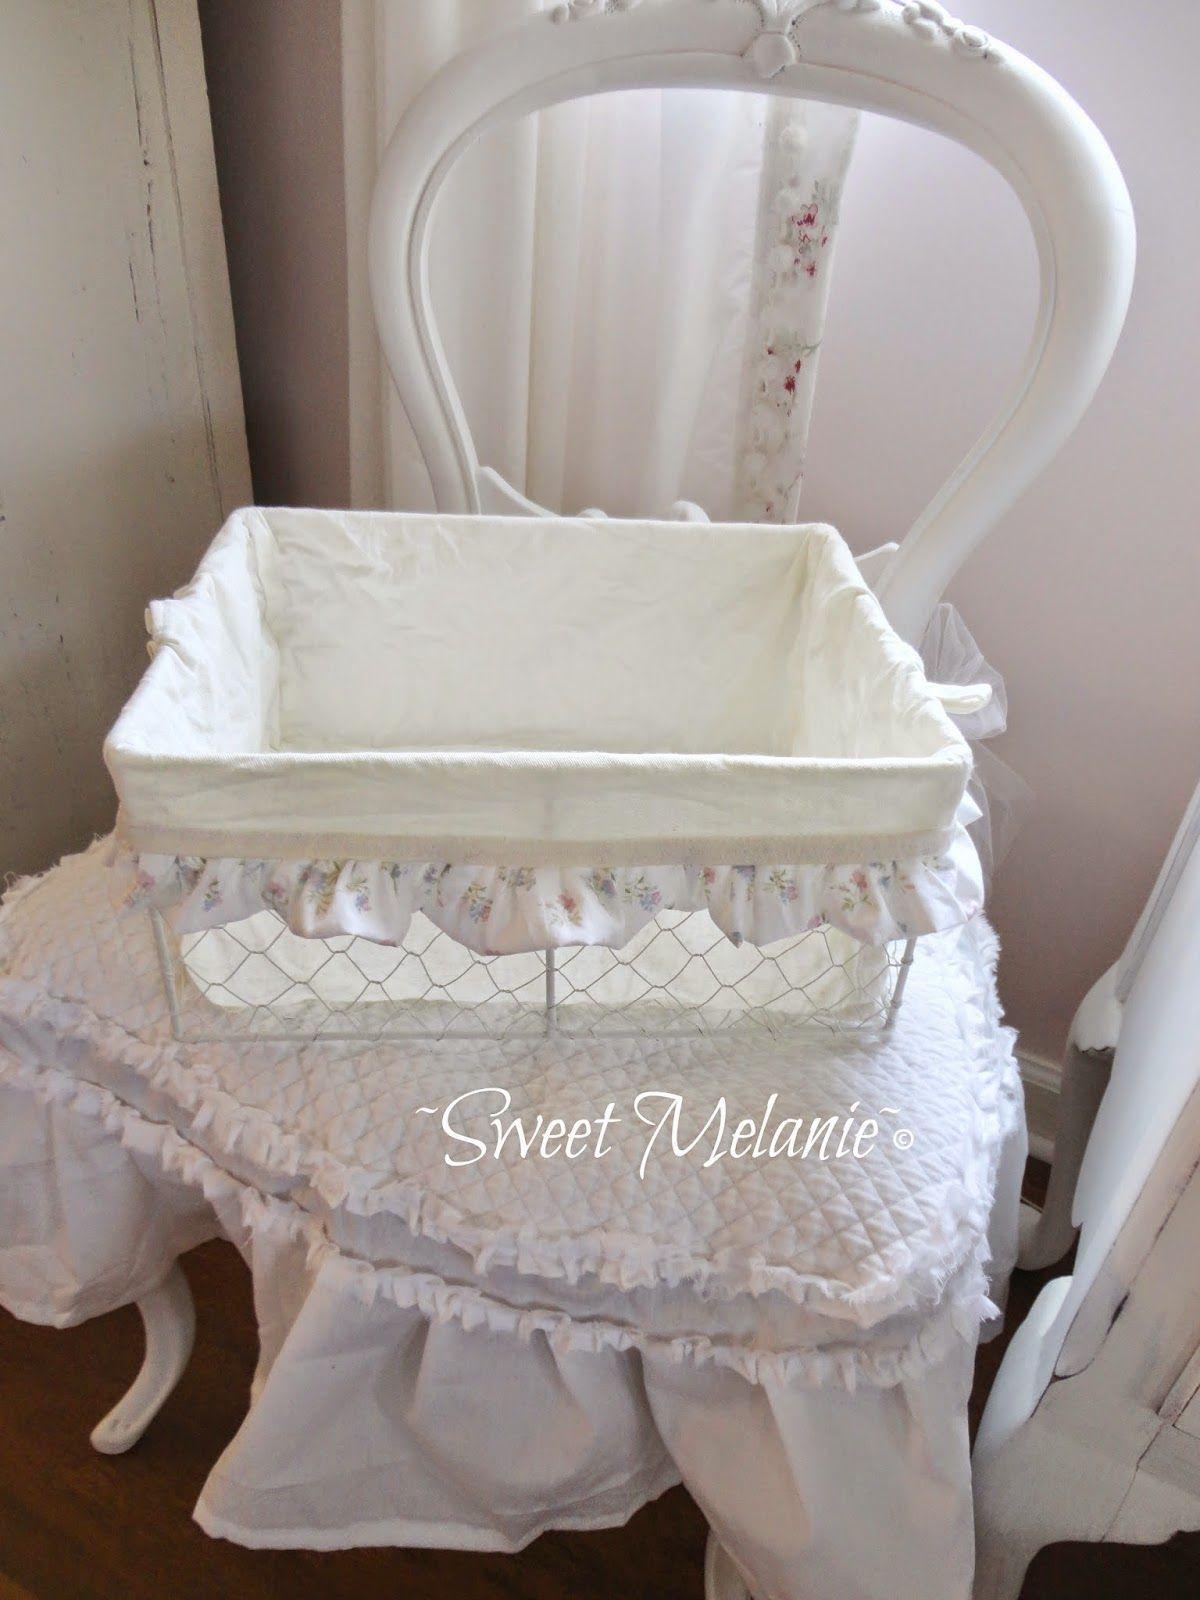 ~Sweet Melanie~: Sew Simple...Yeah I wish